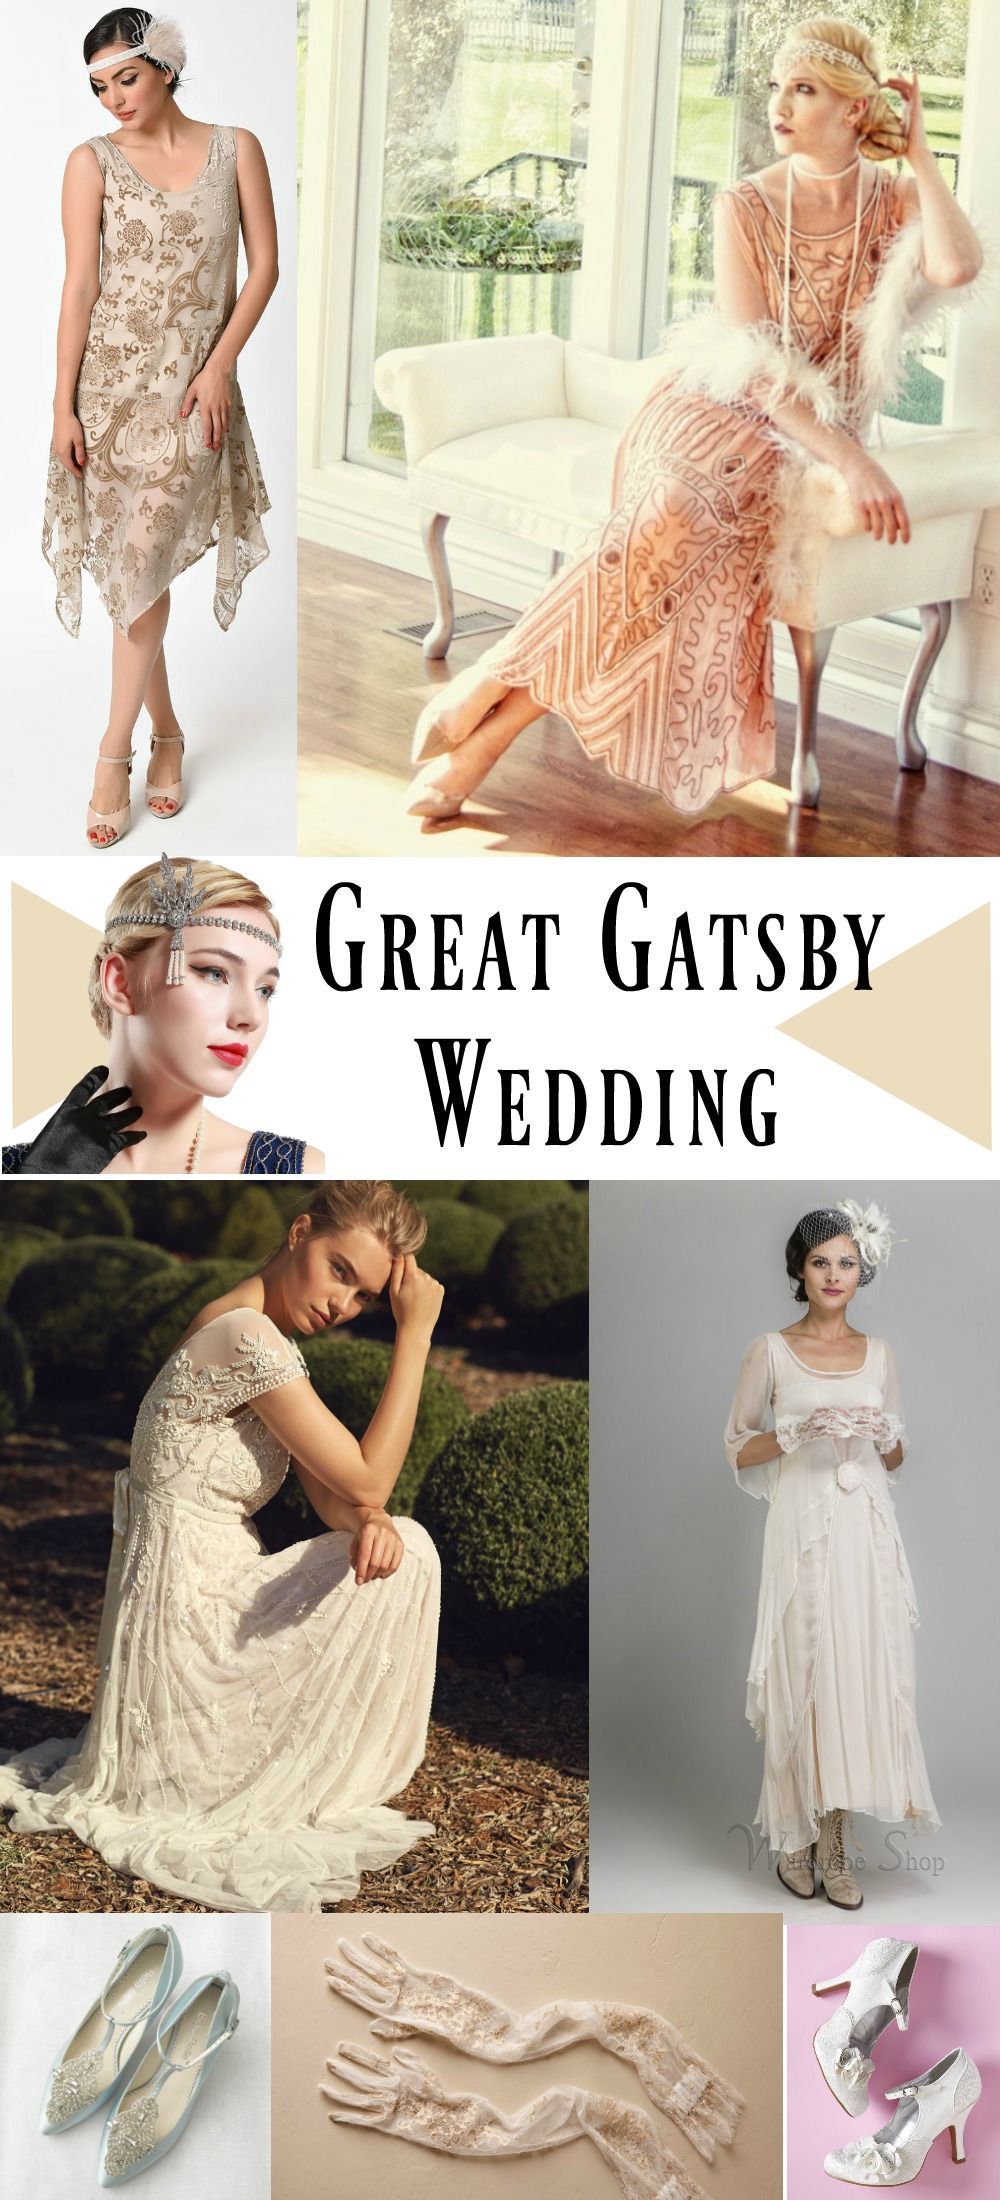 1920s Wedding Dresses Art Deco Wedding Dress Gatsby Wedding Dress Deco Wedding Dress Art Deco Wedding Dress 1920s Wedding Dress